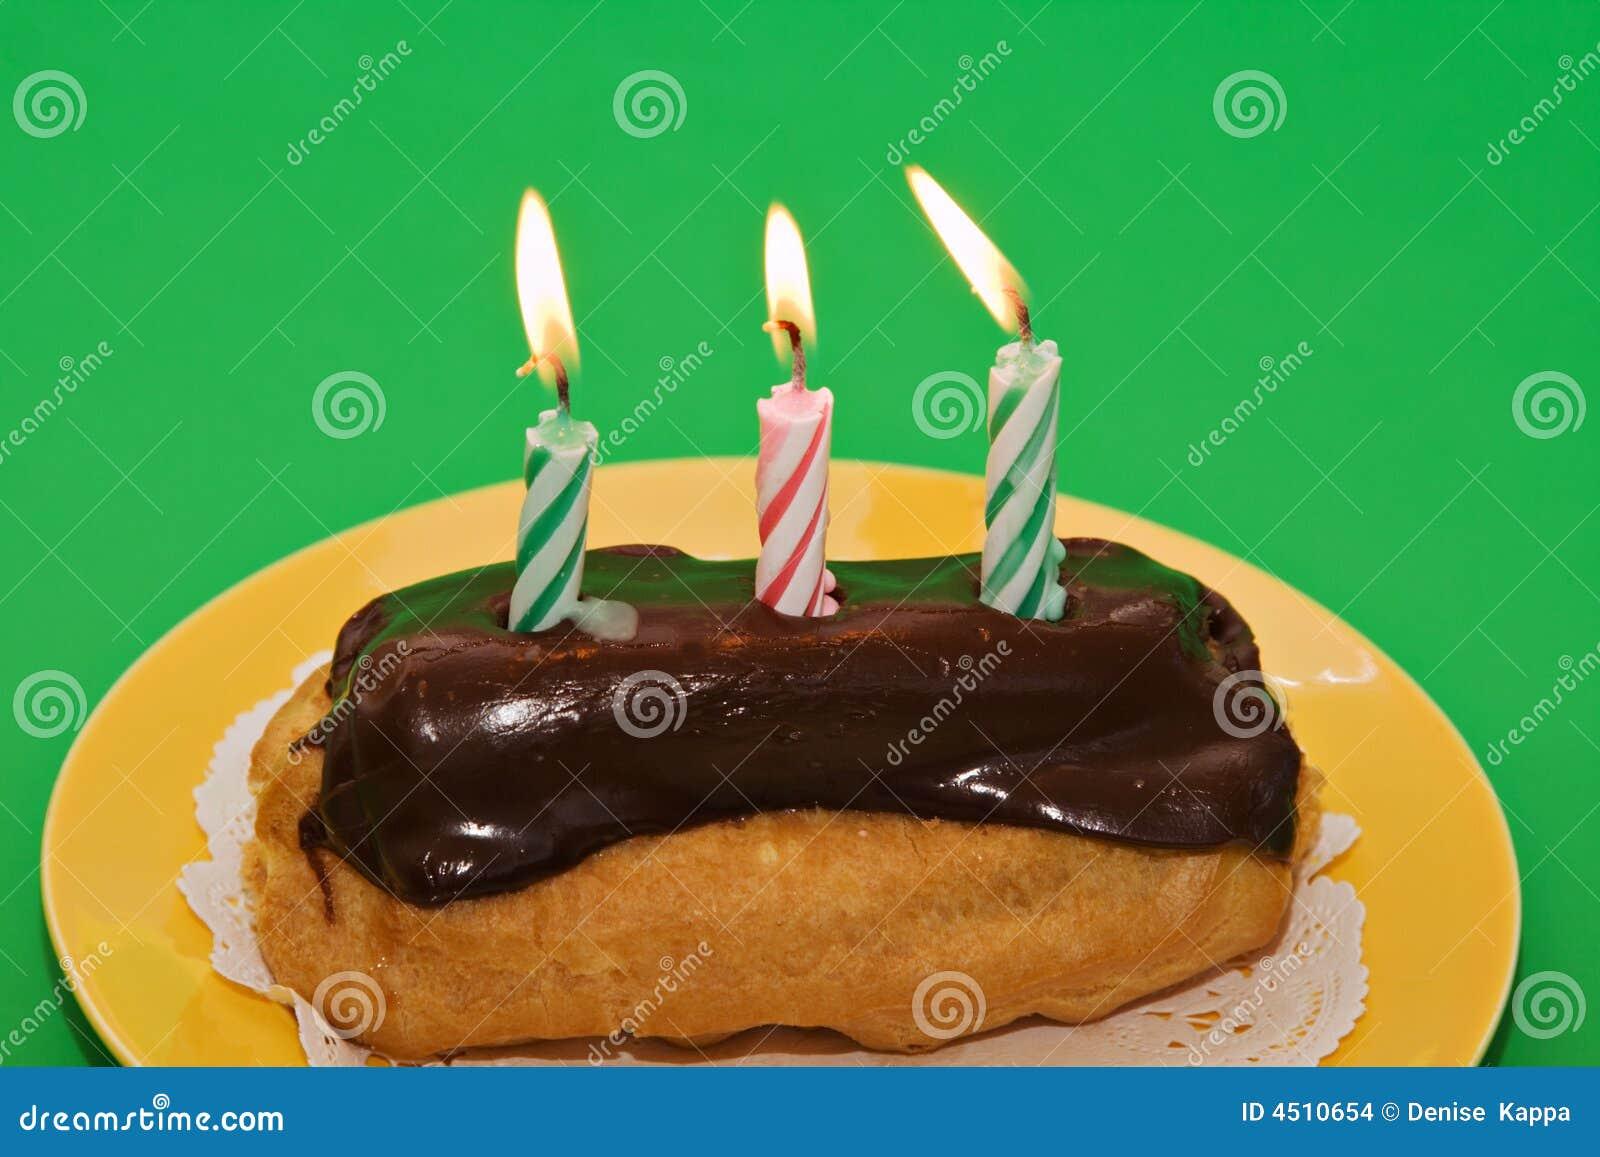 Eclair Birthday Cake